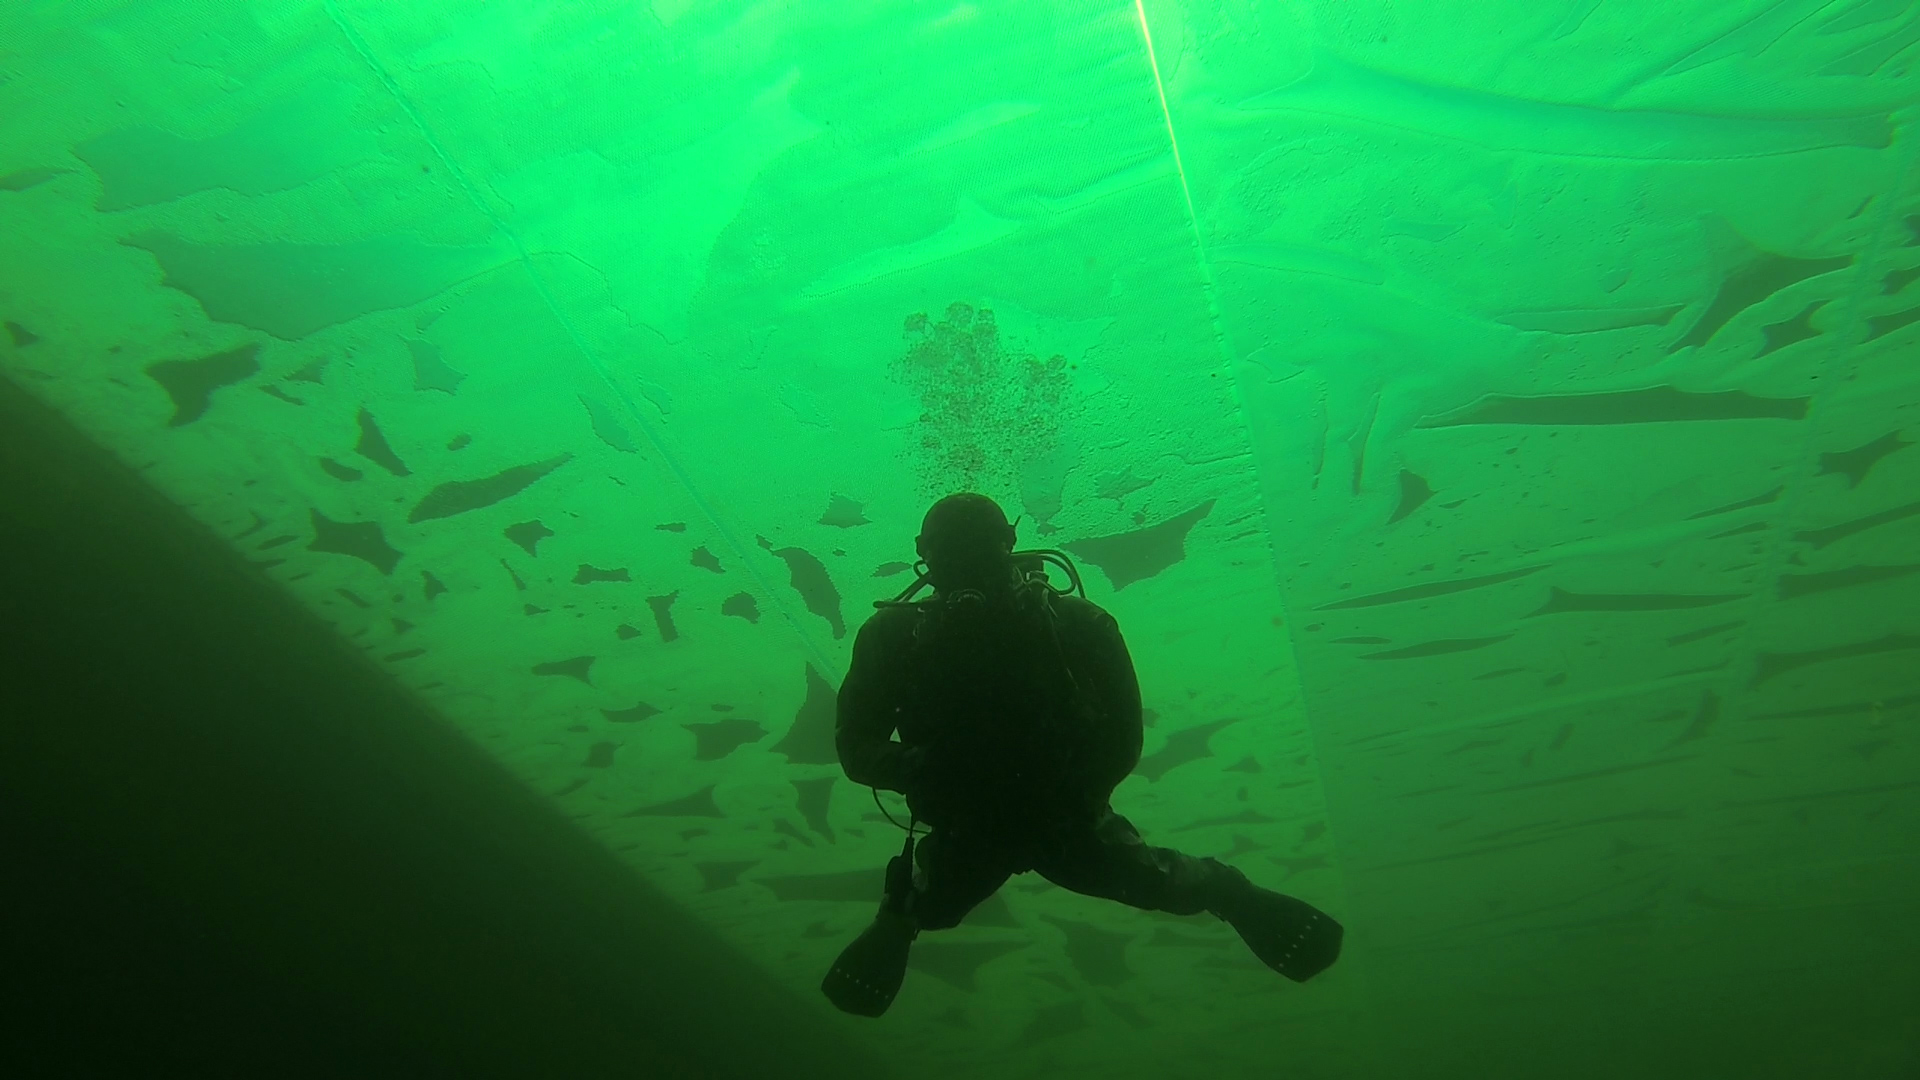 MG Action, Martin Goeres, Diving, Performing, Tauchen